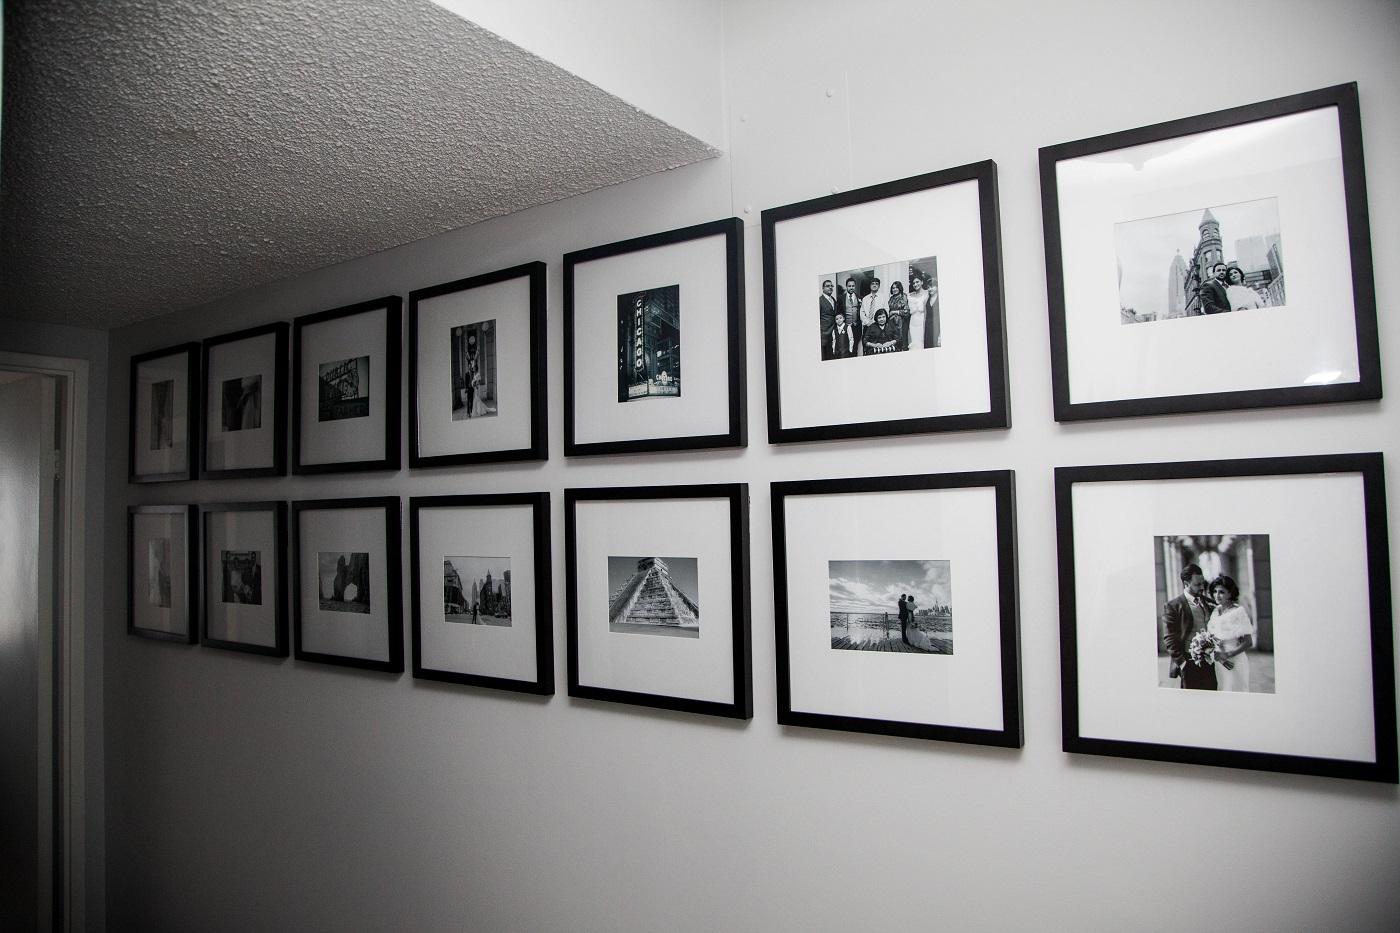 final gallery wall